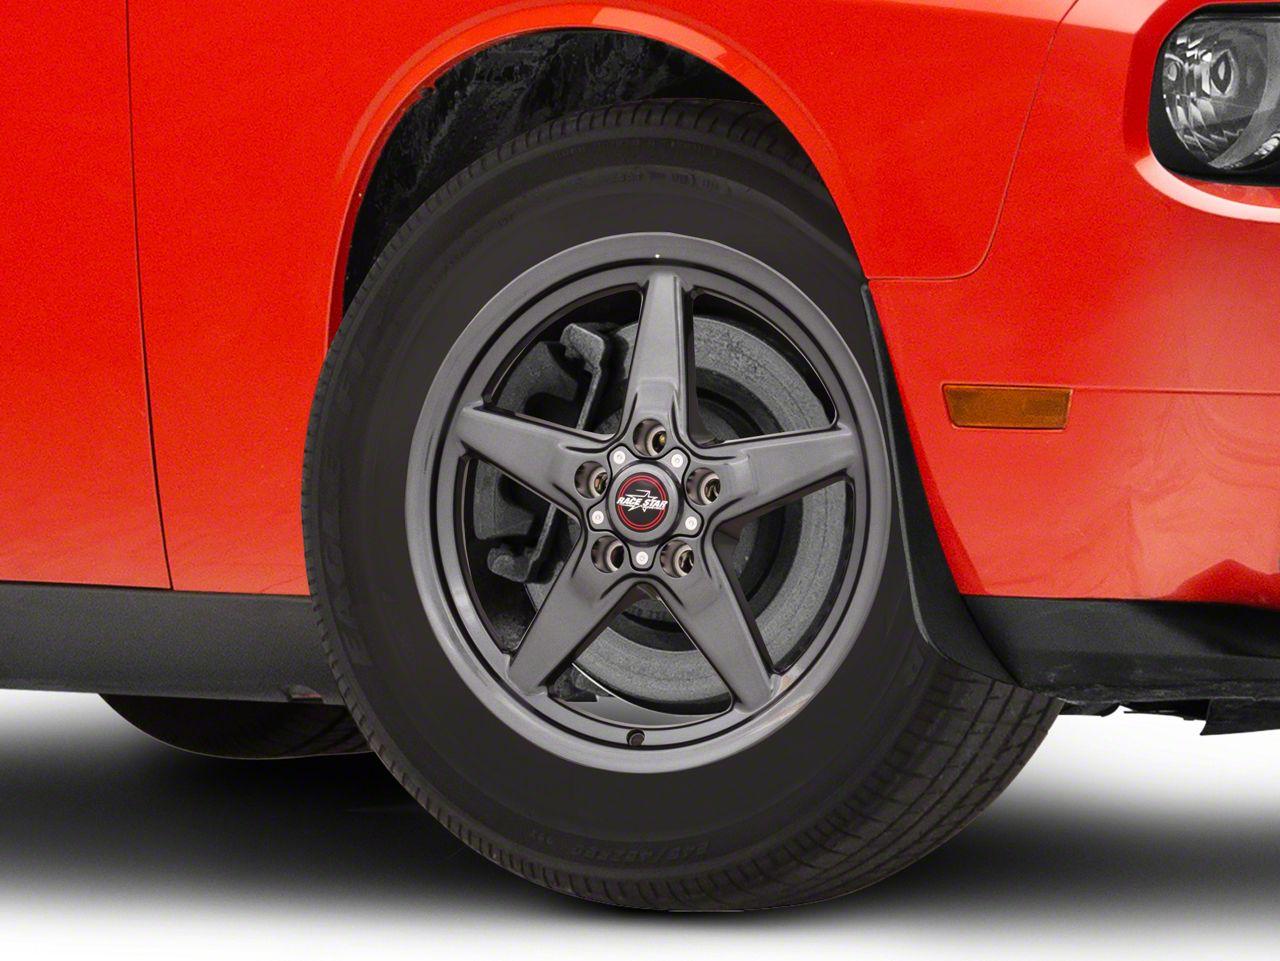 Race Star 92 Drag Star Bracket Racer Metallic Gray Wheel - 17x4.5 (08-18 All, Excluding Demon & Hellcat)